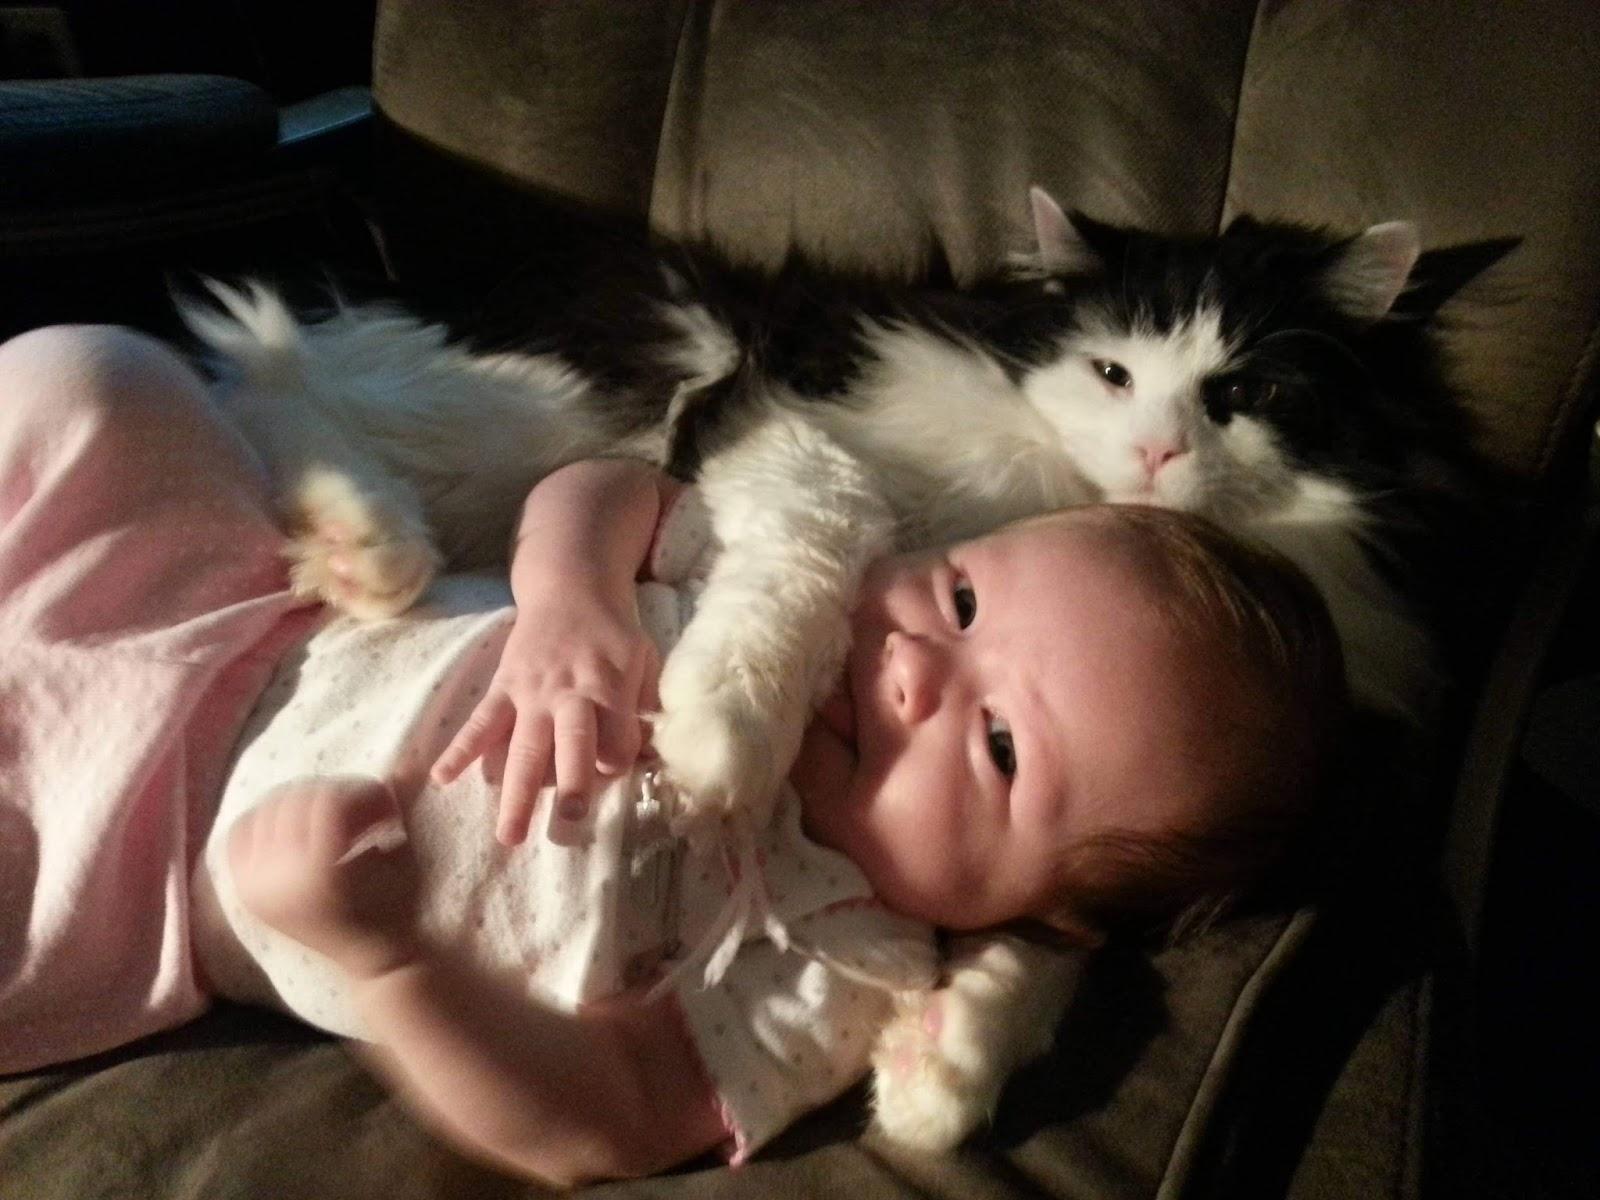 Funny cats - part 242, cute cat images, best cat photos